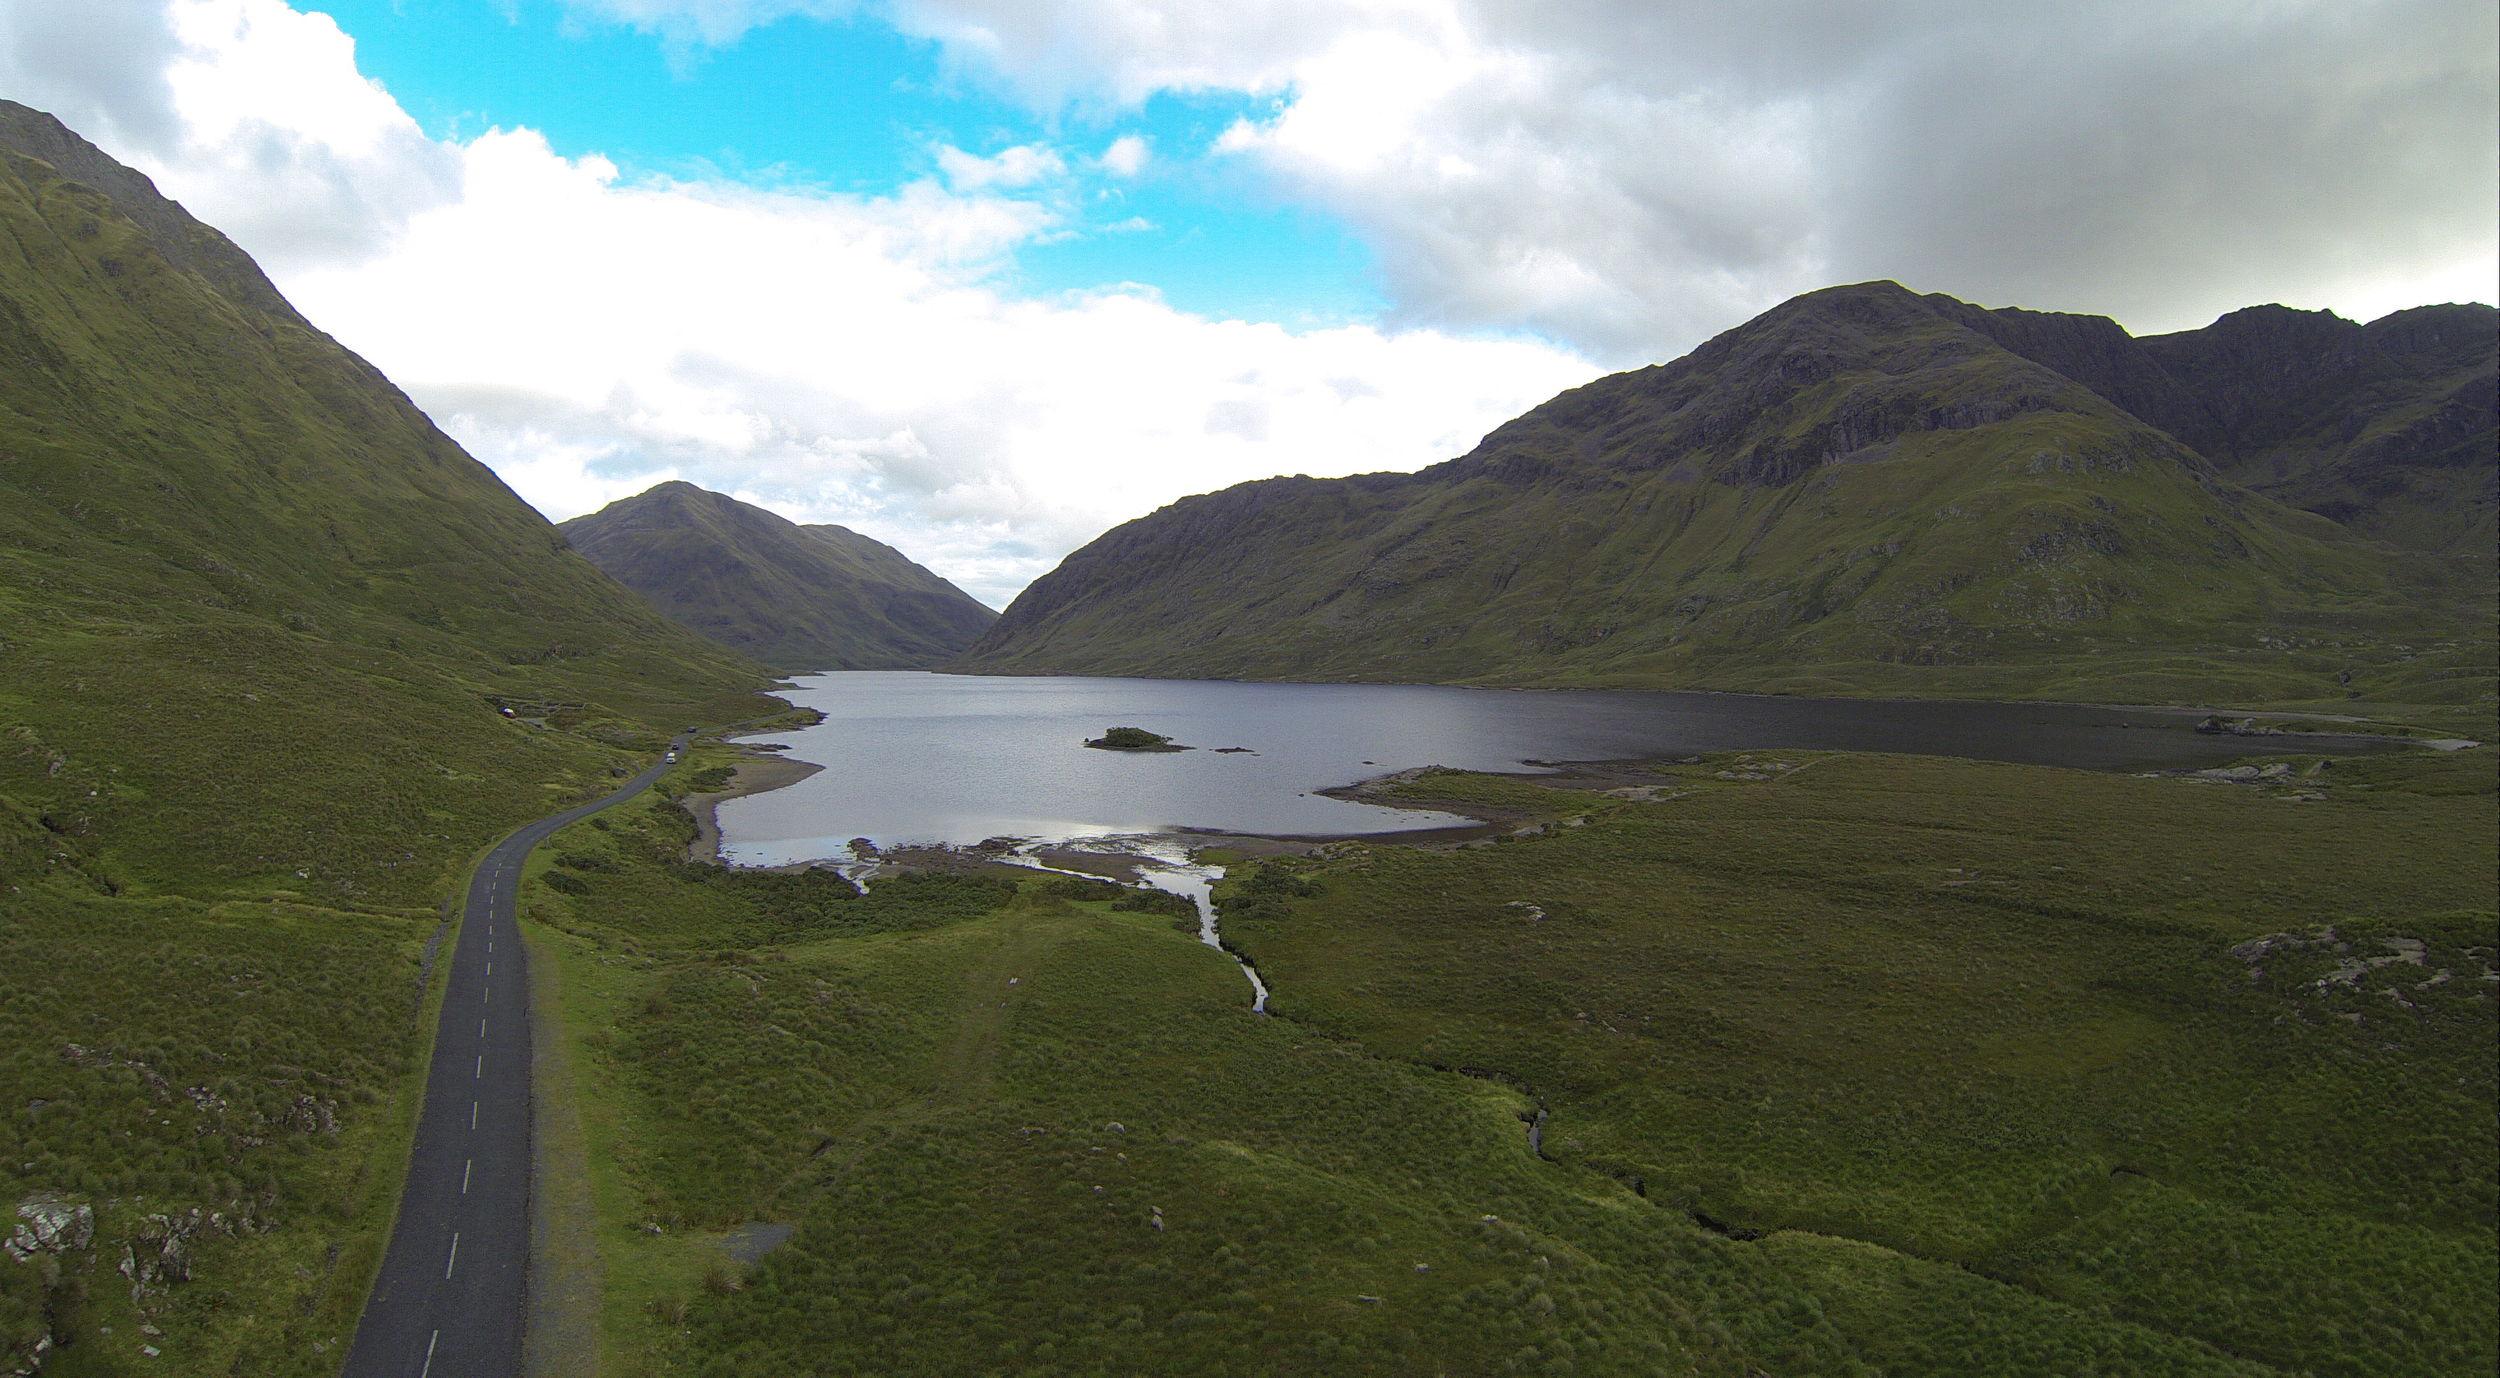 Aerial shot of Wild Atlanticon the Leenane road.